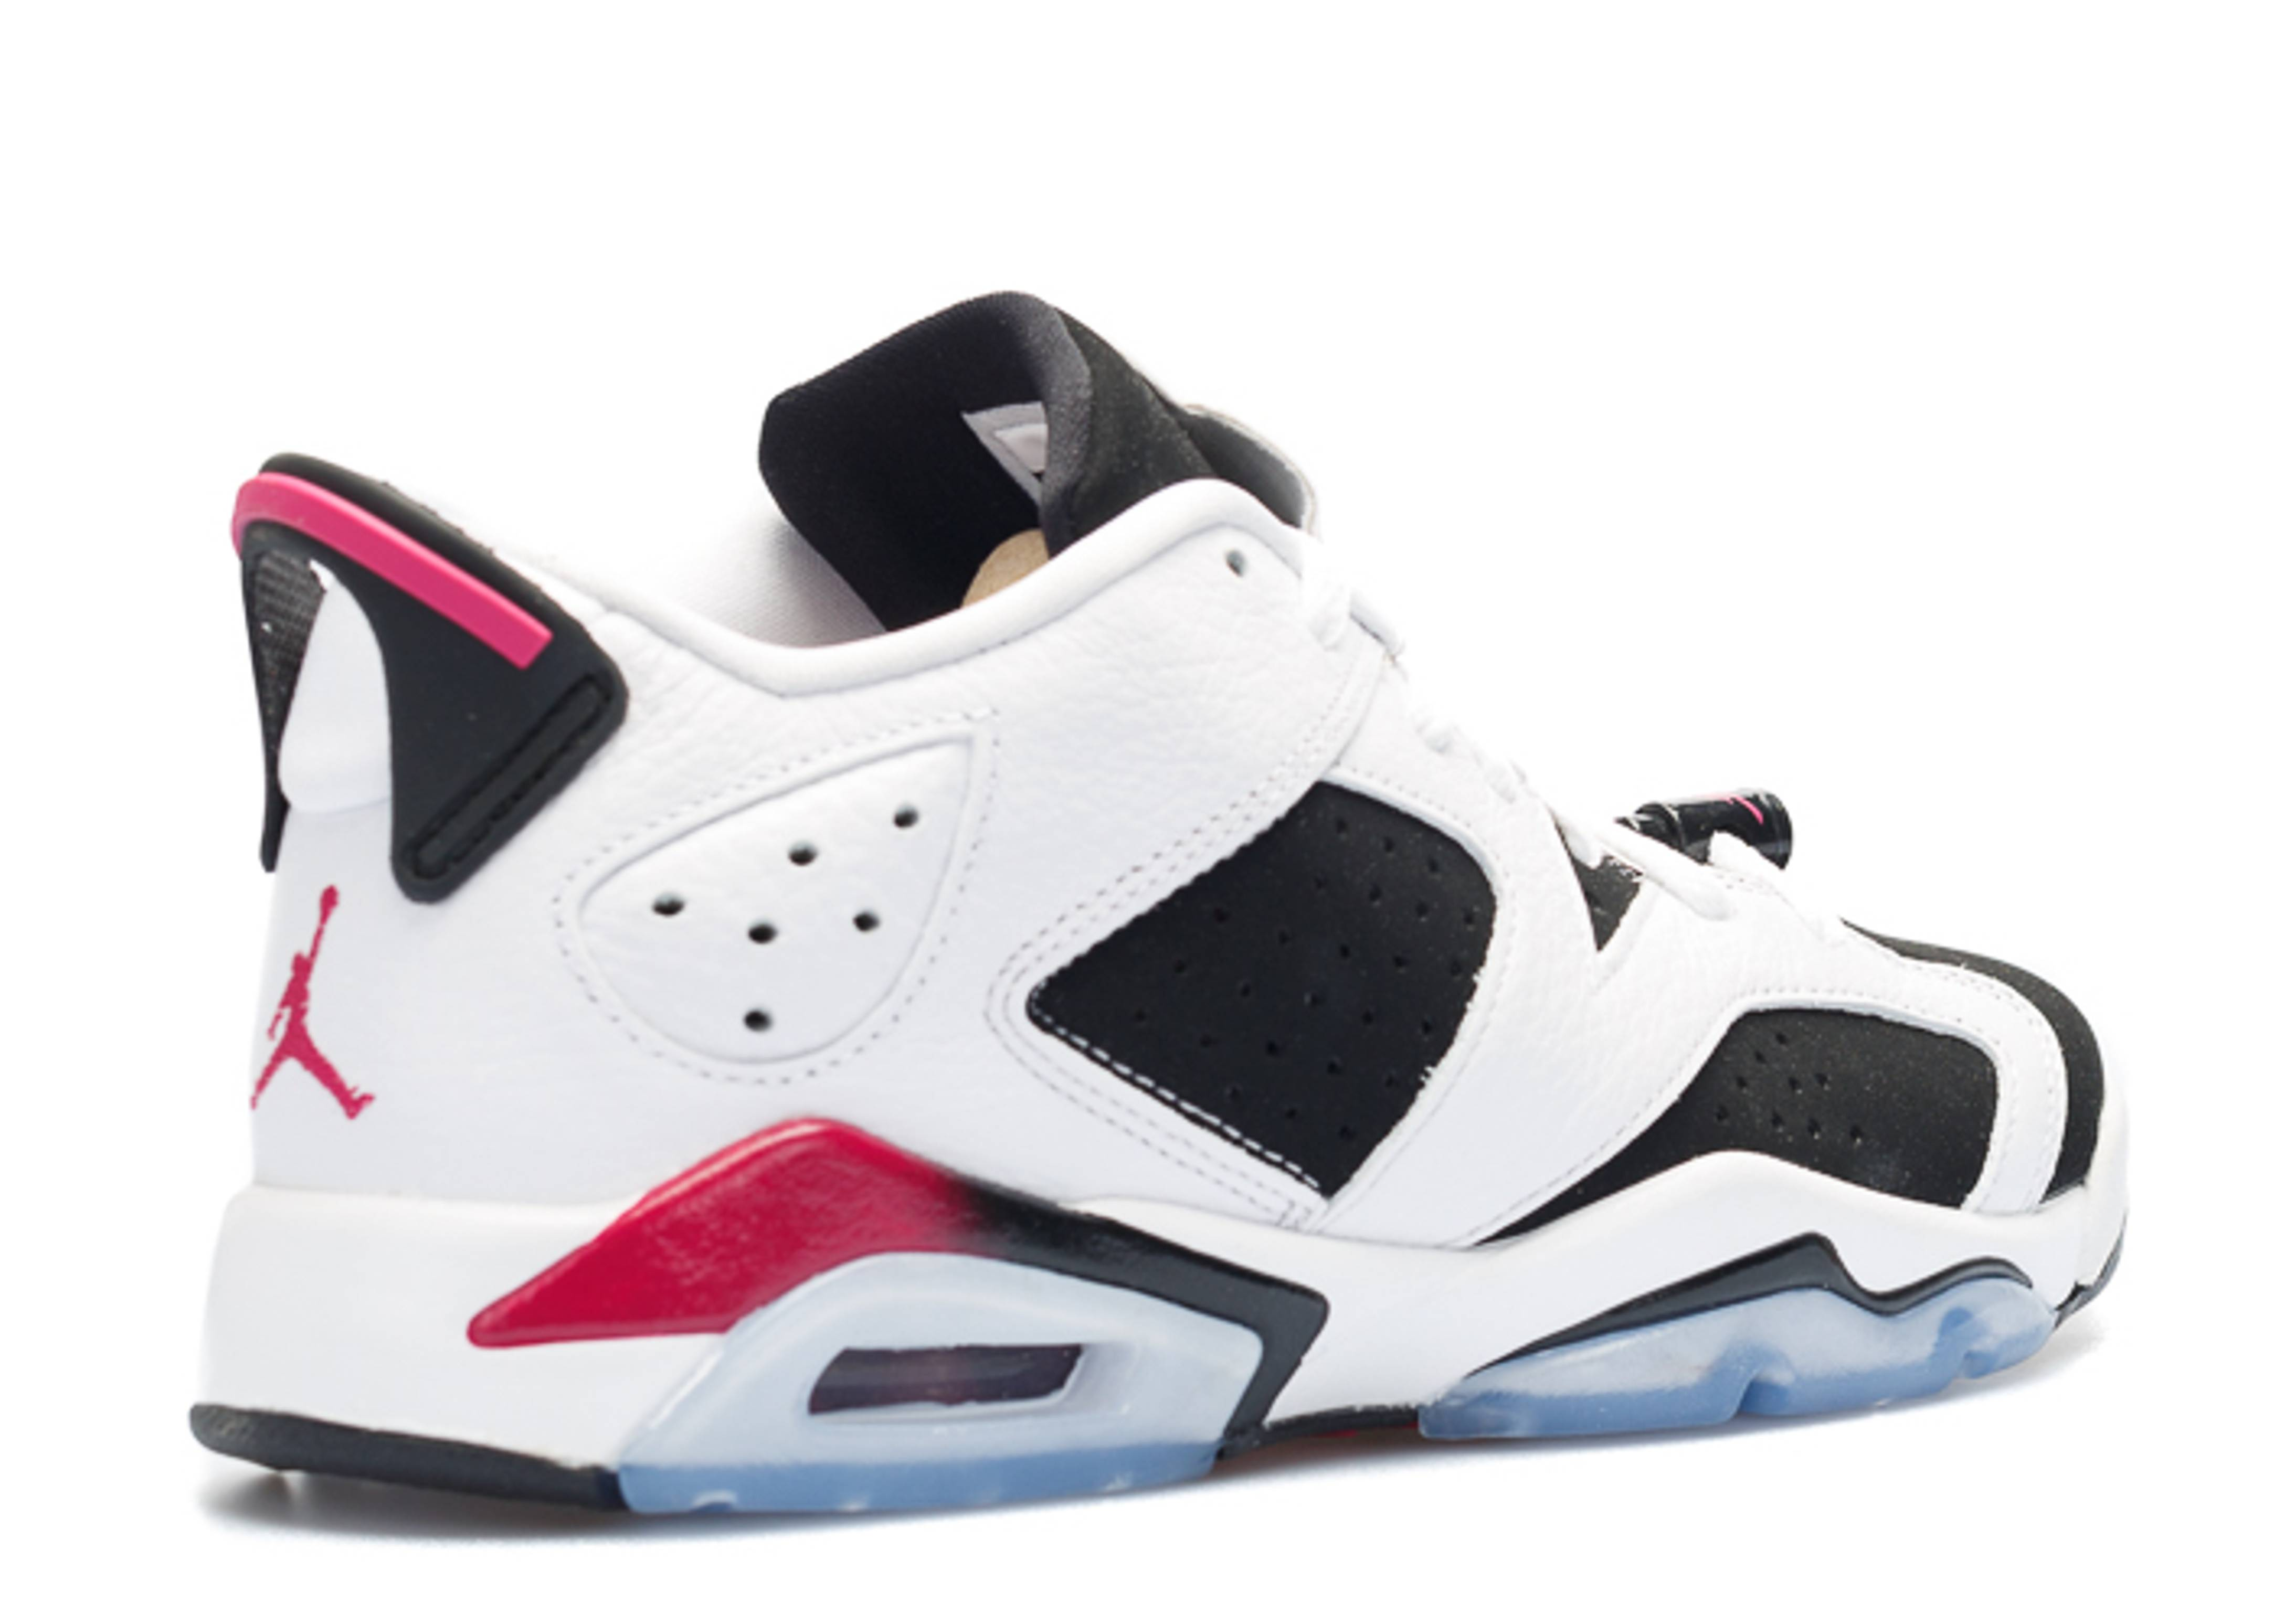 Jordan 6 Retro Low